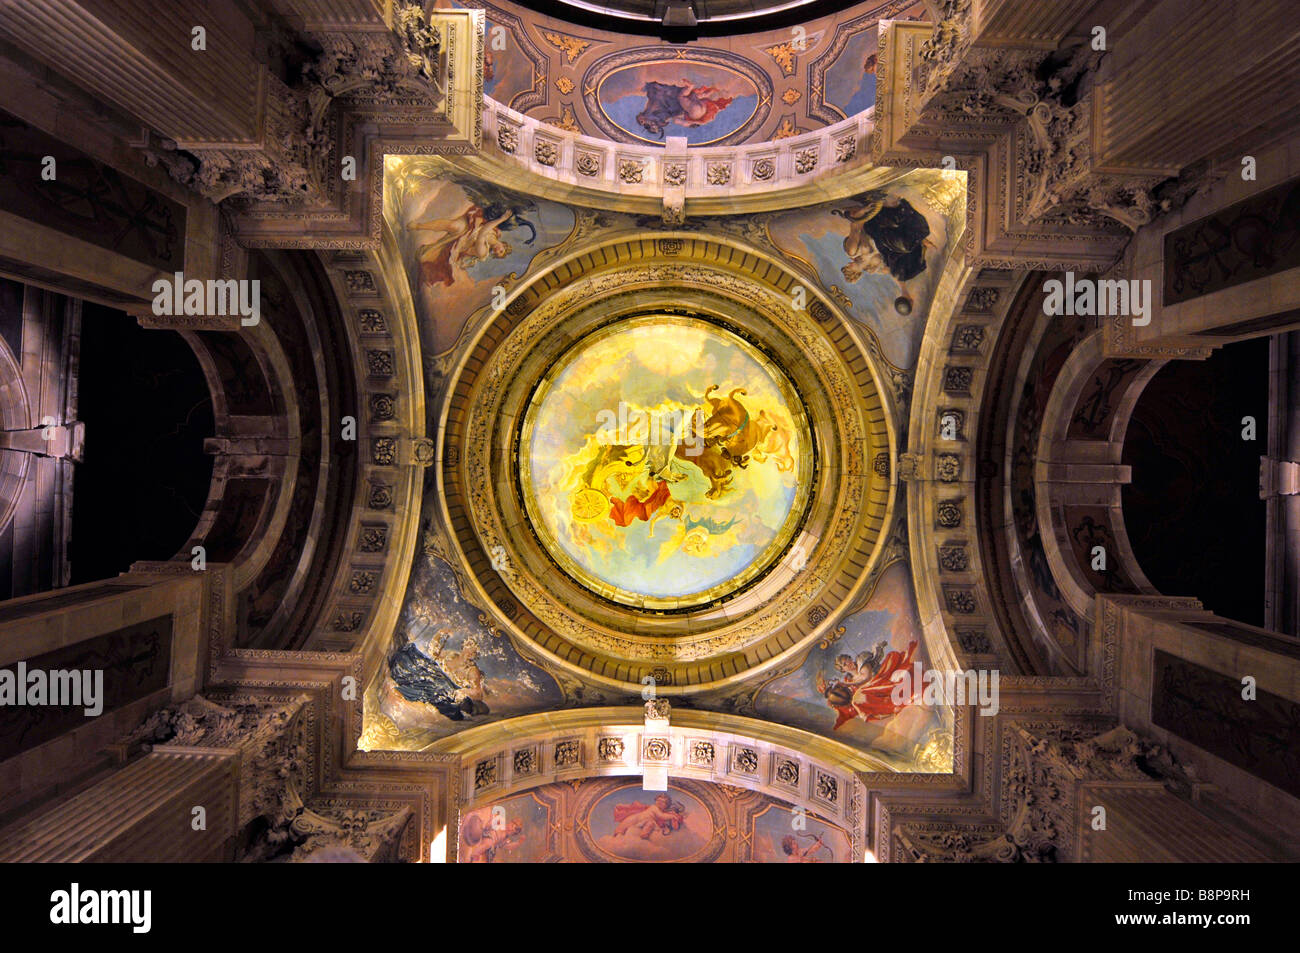 "Die Decke der großen Halle bei ""Castle Howard"" Yorkshire, England, UK Stockbild"